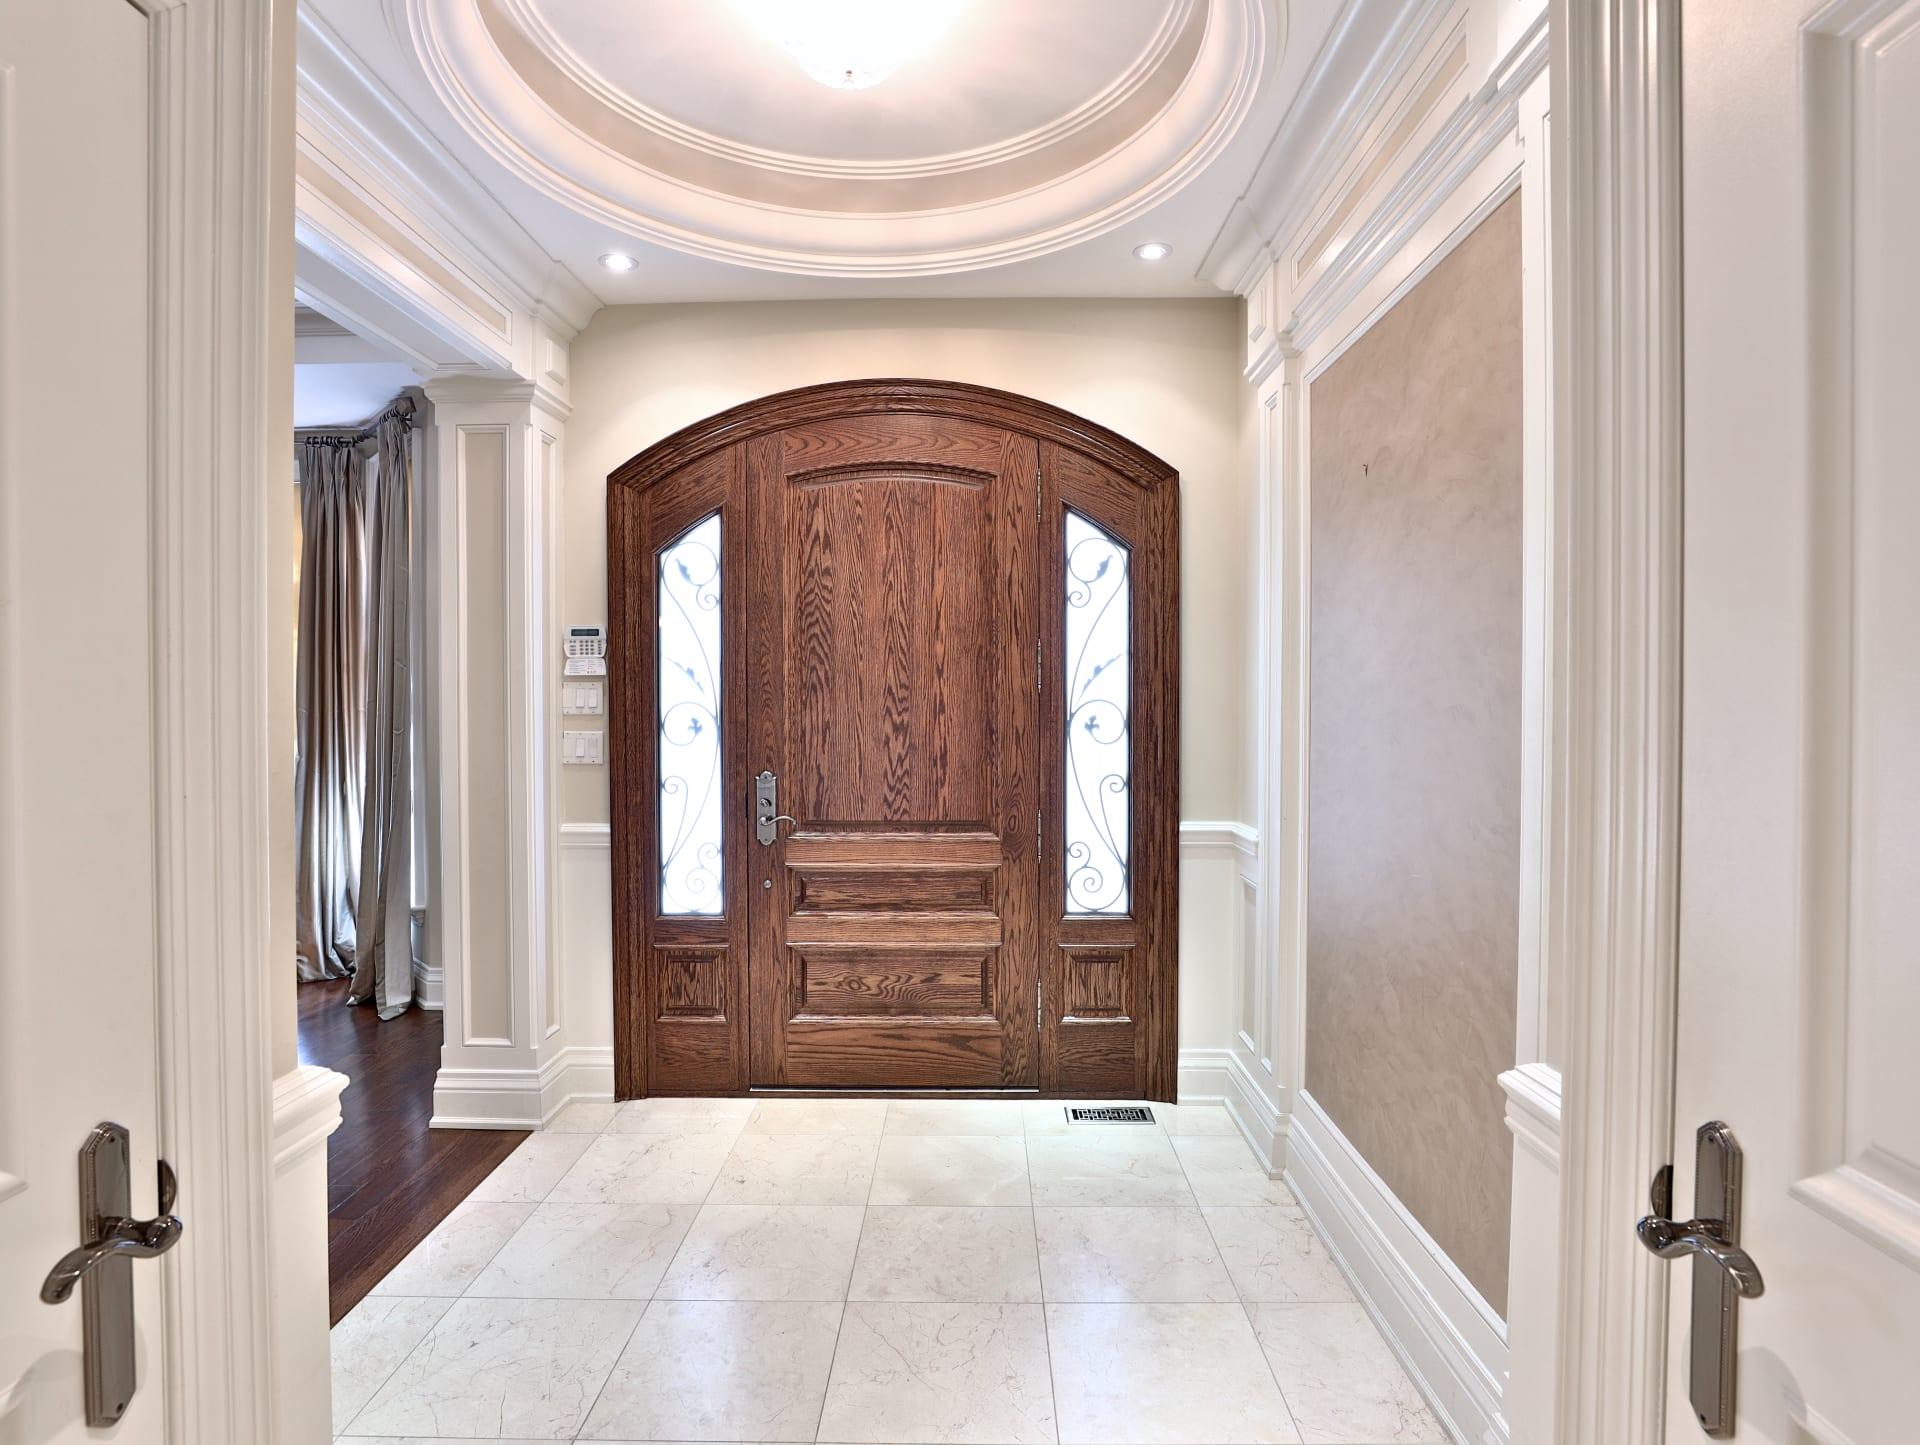 Remastered St. Andrews 5 Bedroom Residence